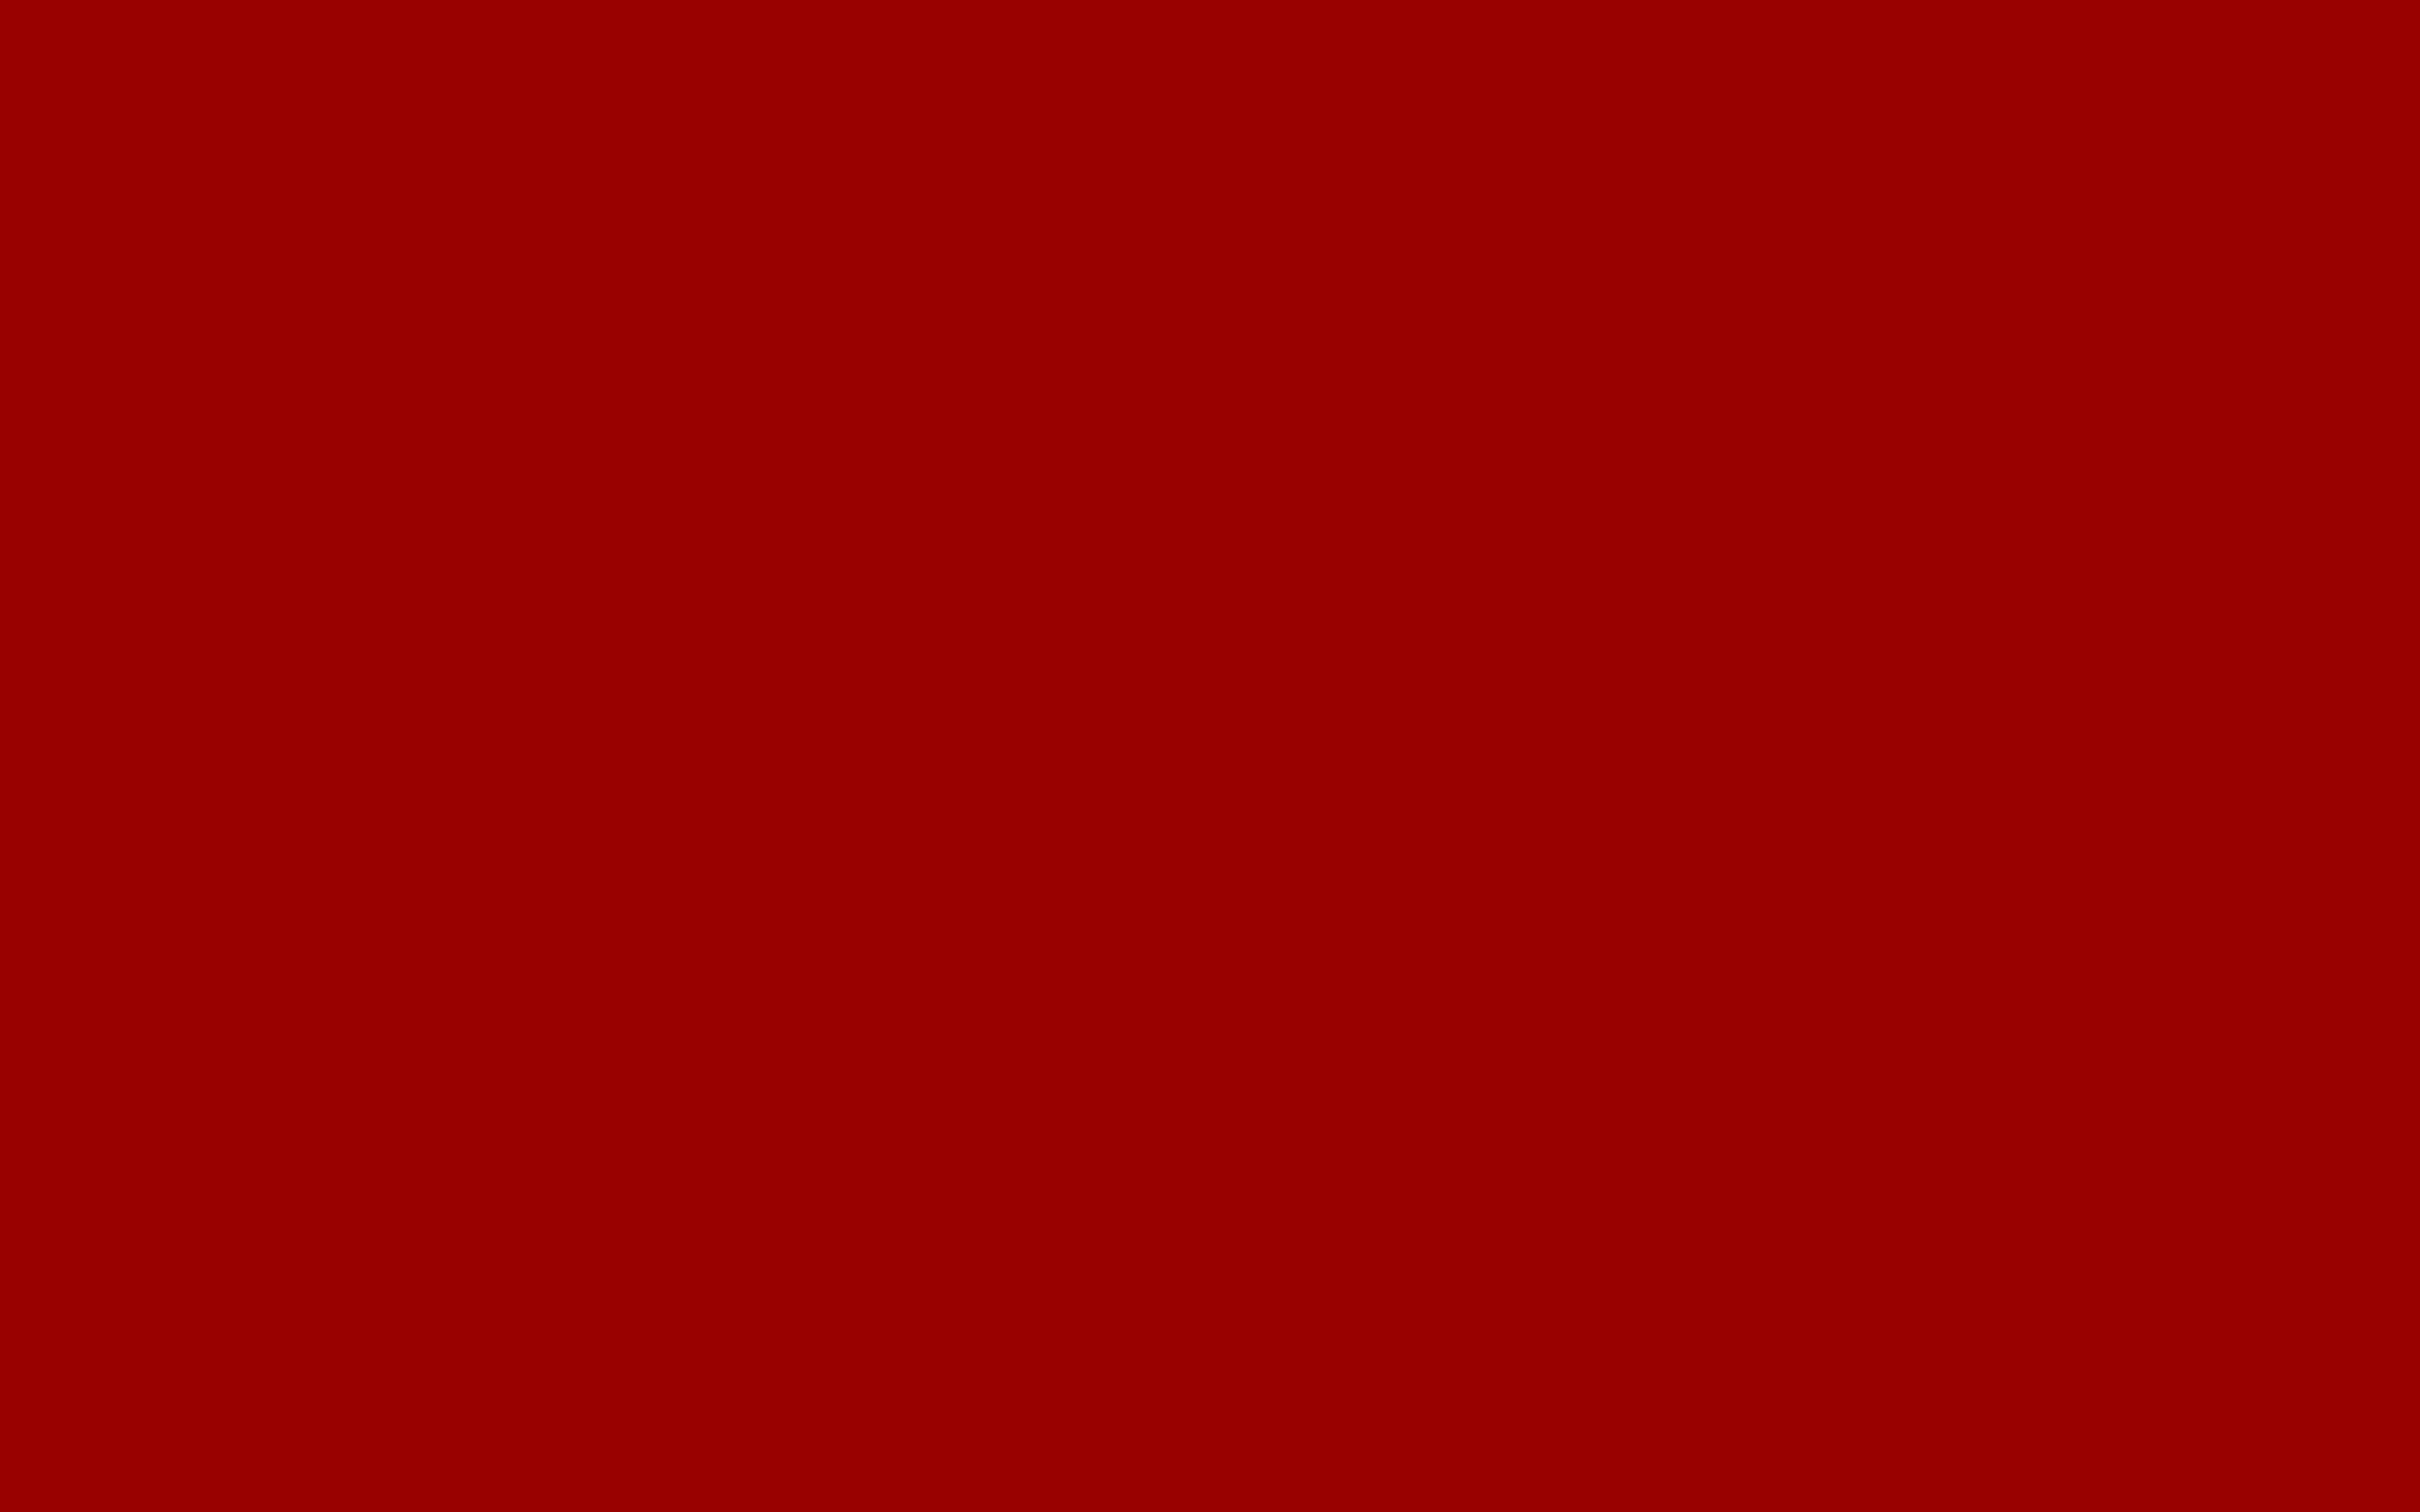 2560x1600 Stizza Solid Color Background